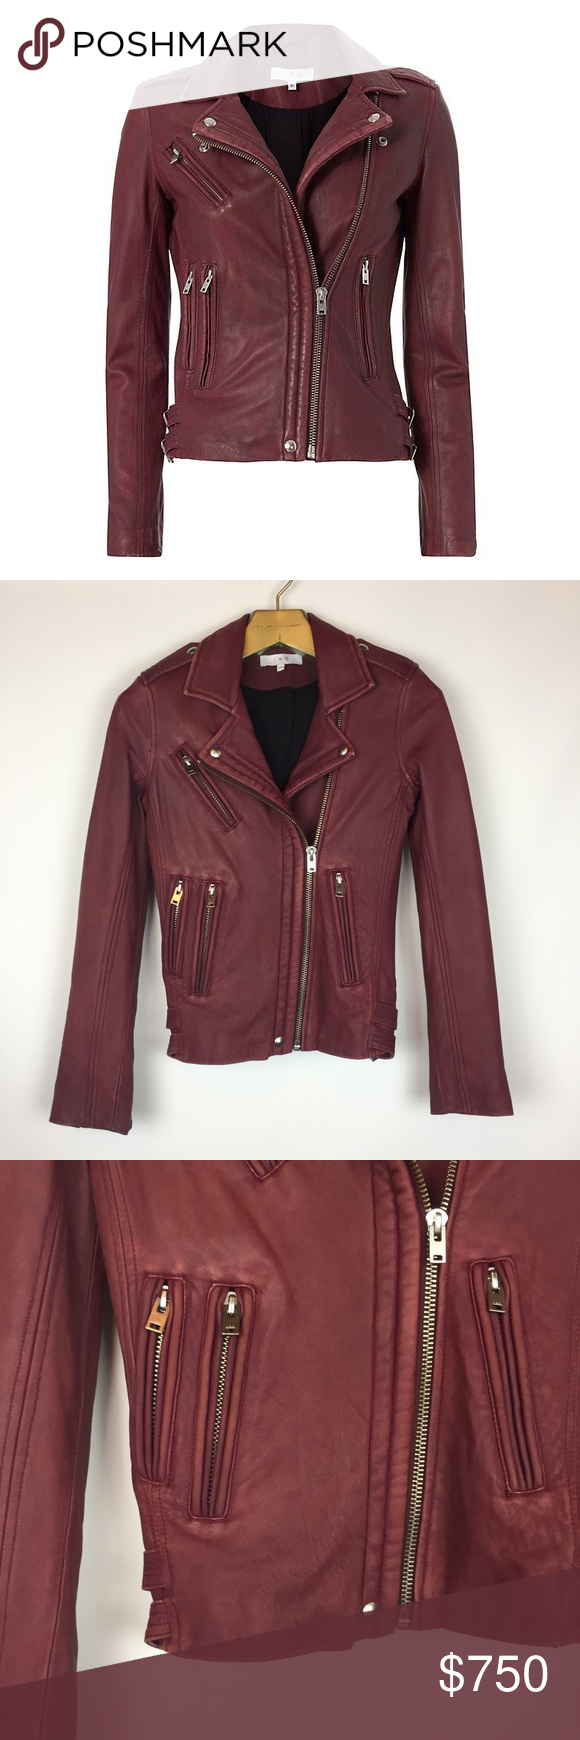 Iro Han Burgundy Lamb Leather Moto Jacket Xs Leather Moto Jacket Jackets Moto Jacket [ 1740 x 580 Pixel ]